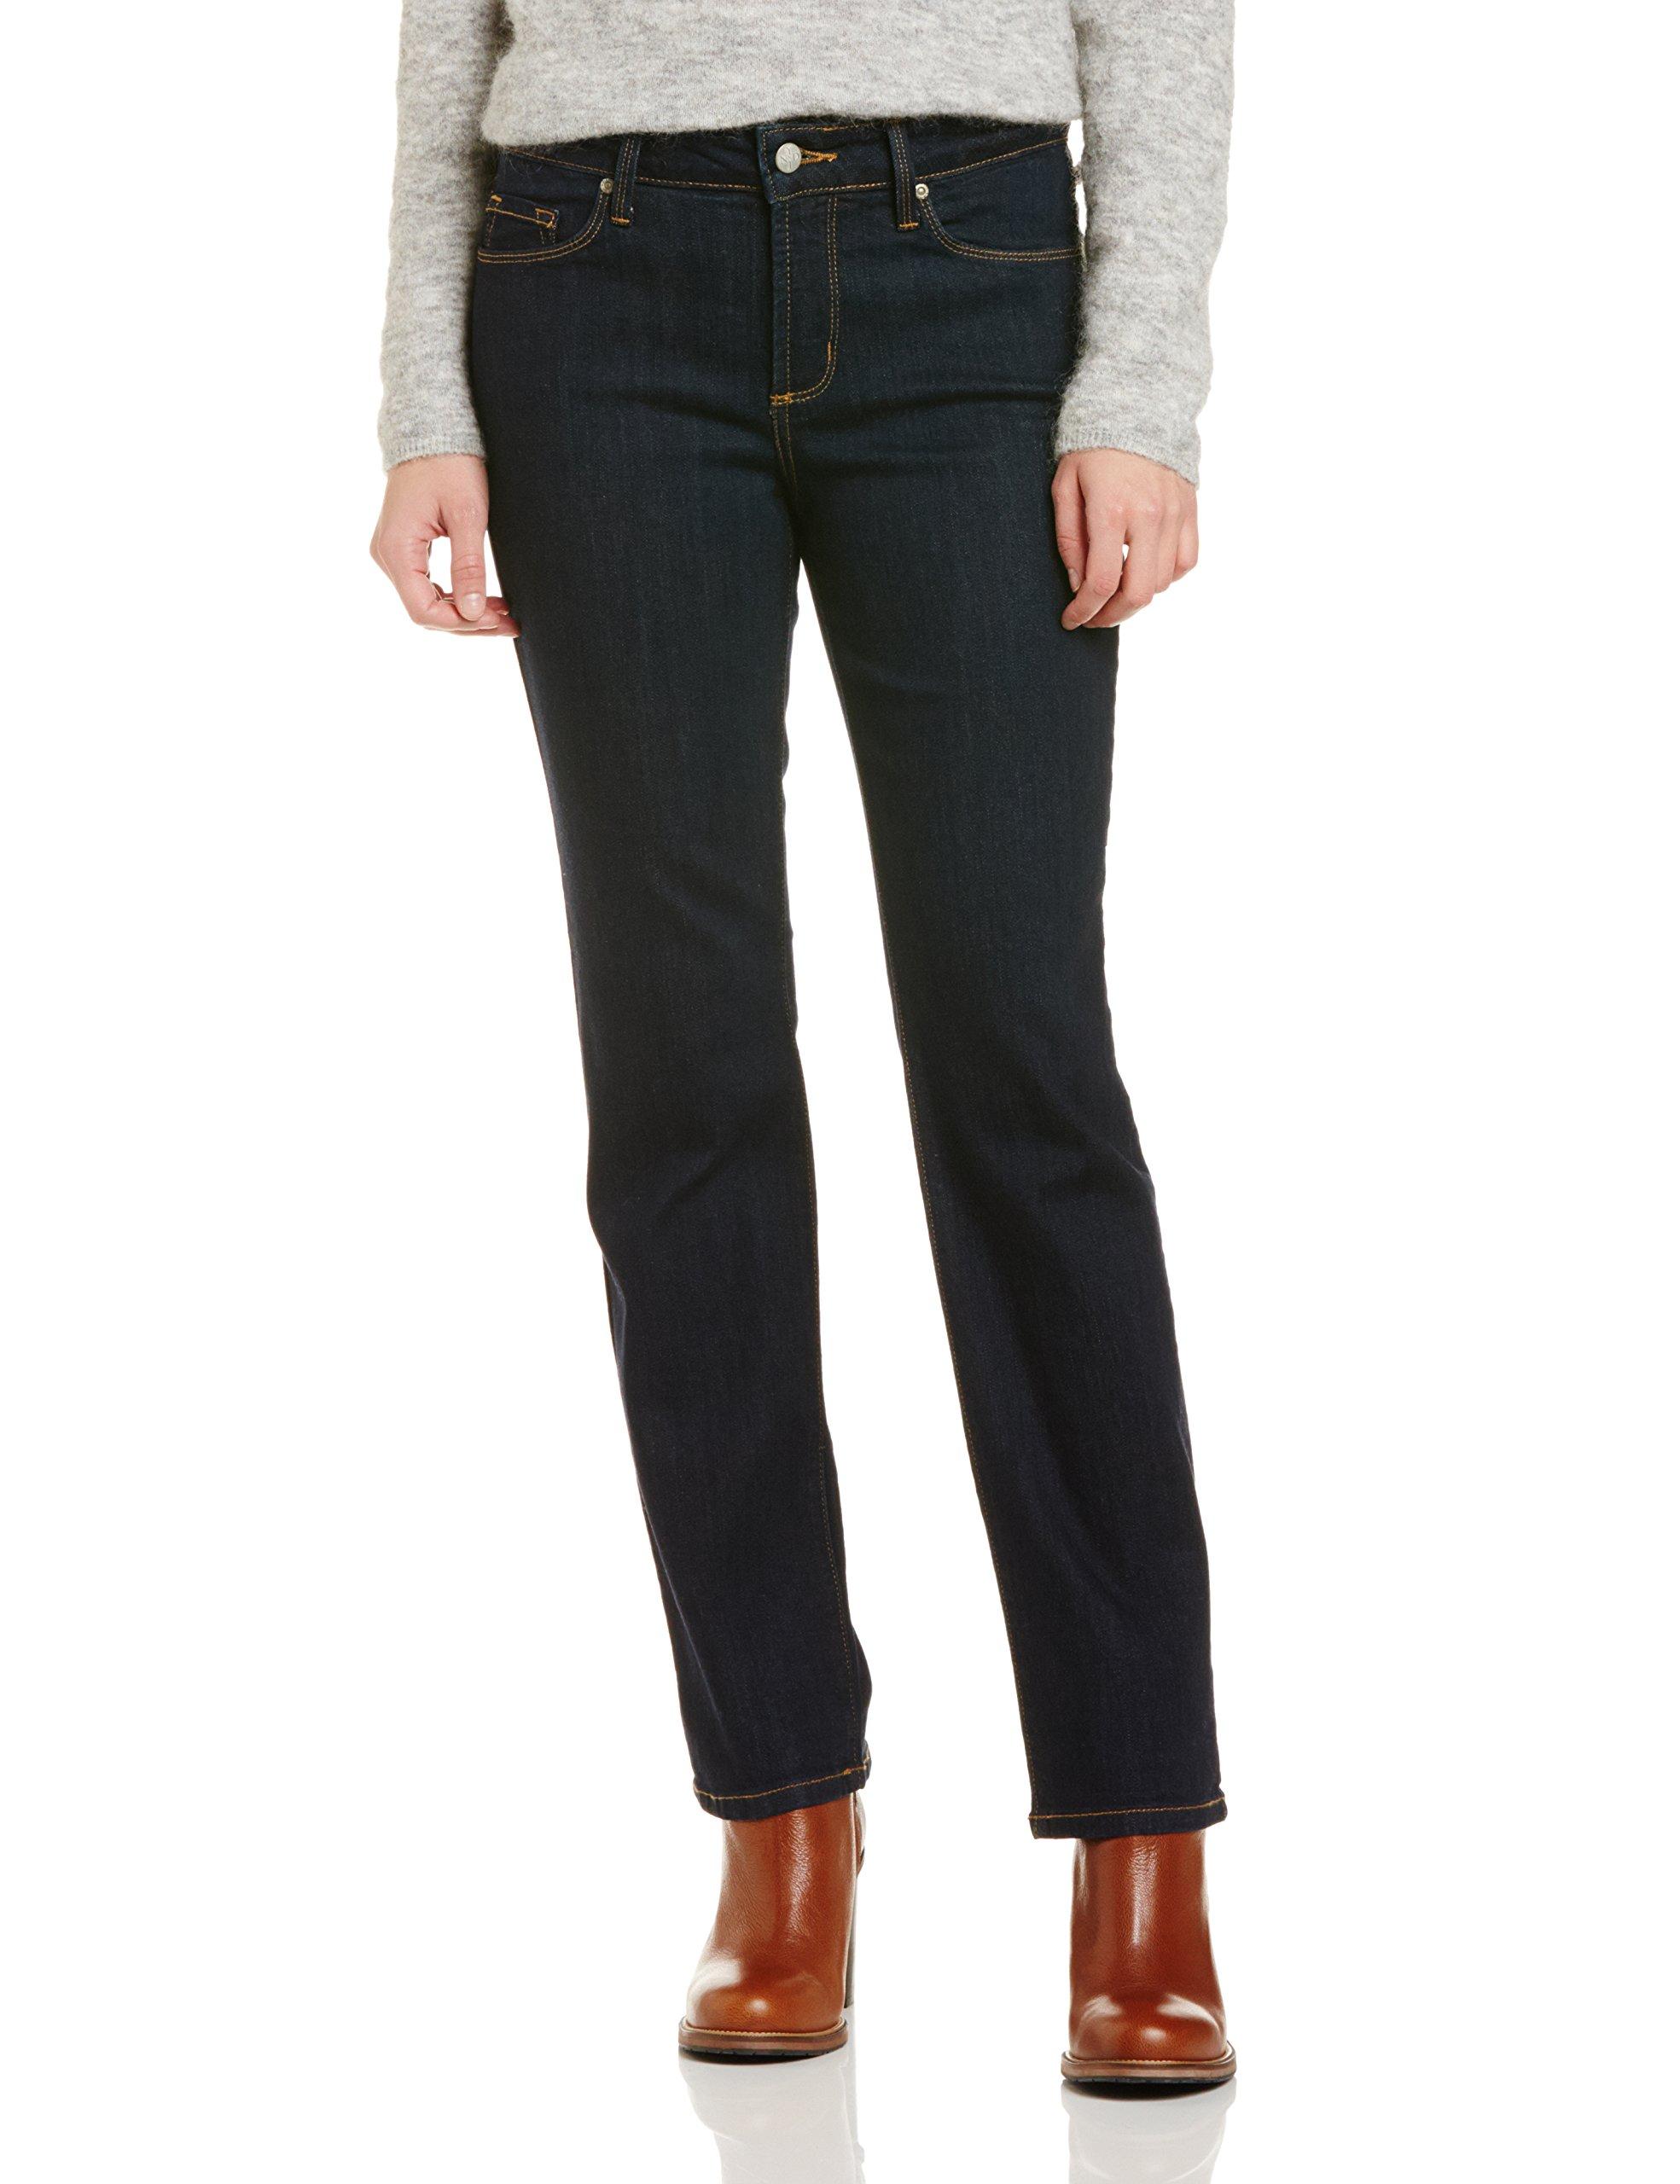 Frtaille FemmeBleudark Droit Nydj Denim46 P95477ltJeans Fabricant18 ulFcKJ3T1